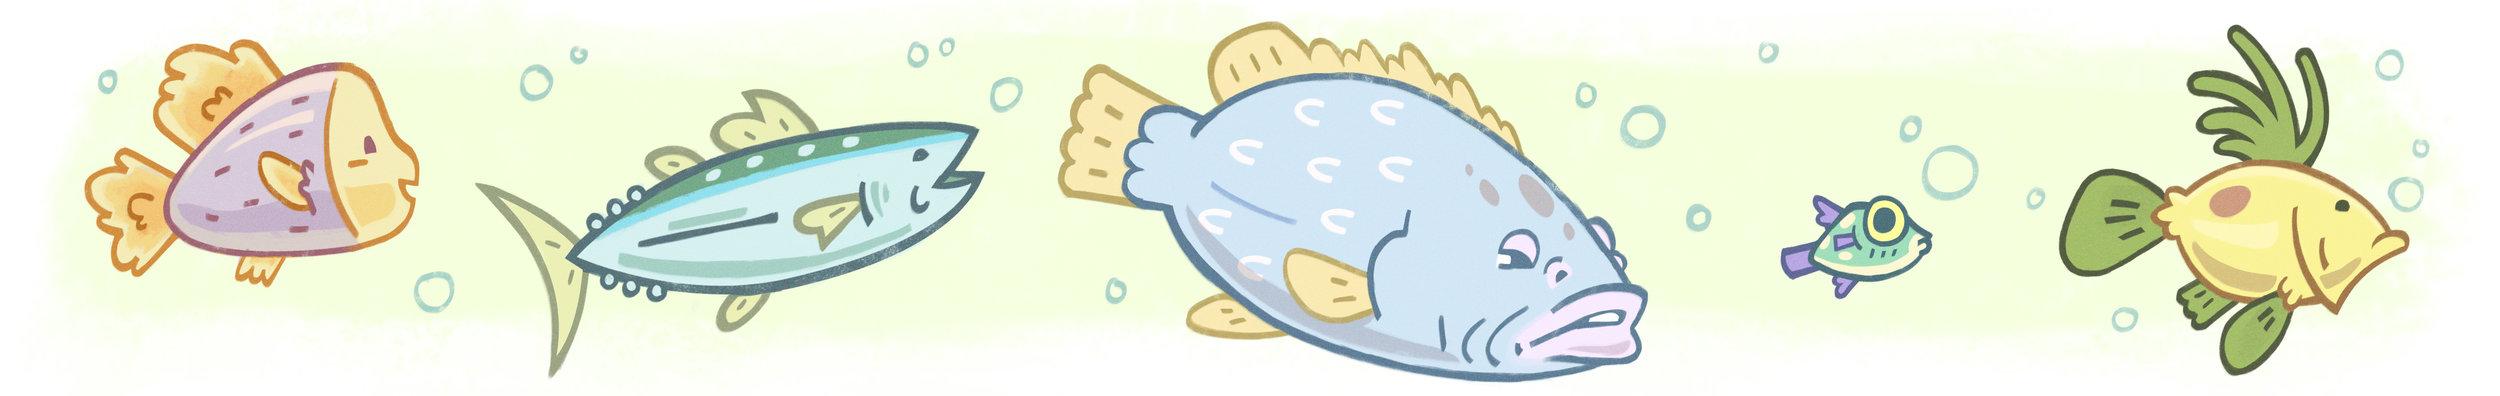 fish banner.jpg